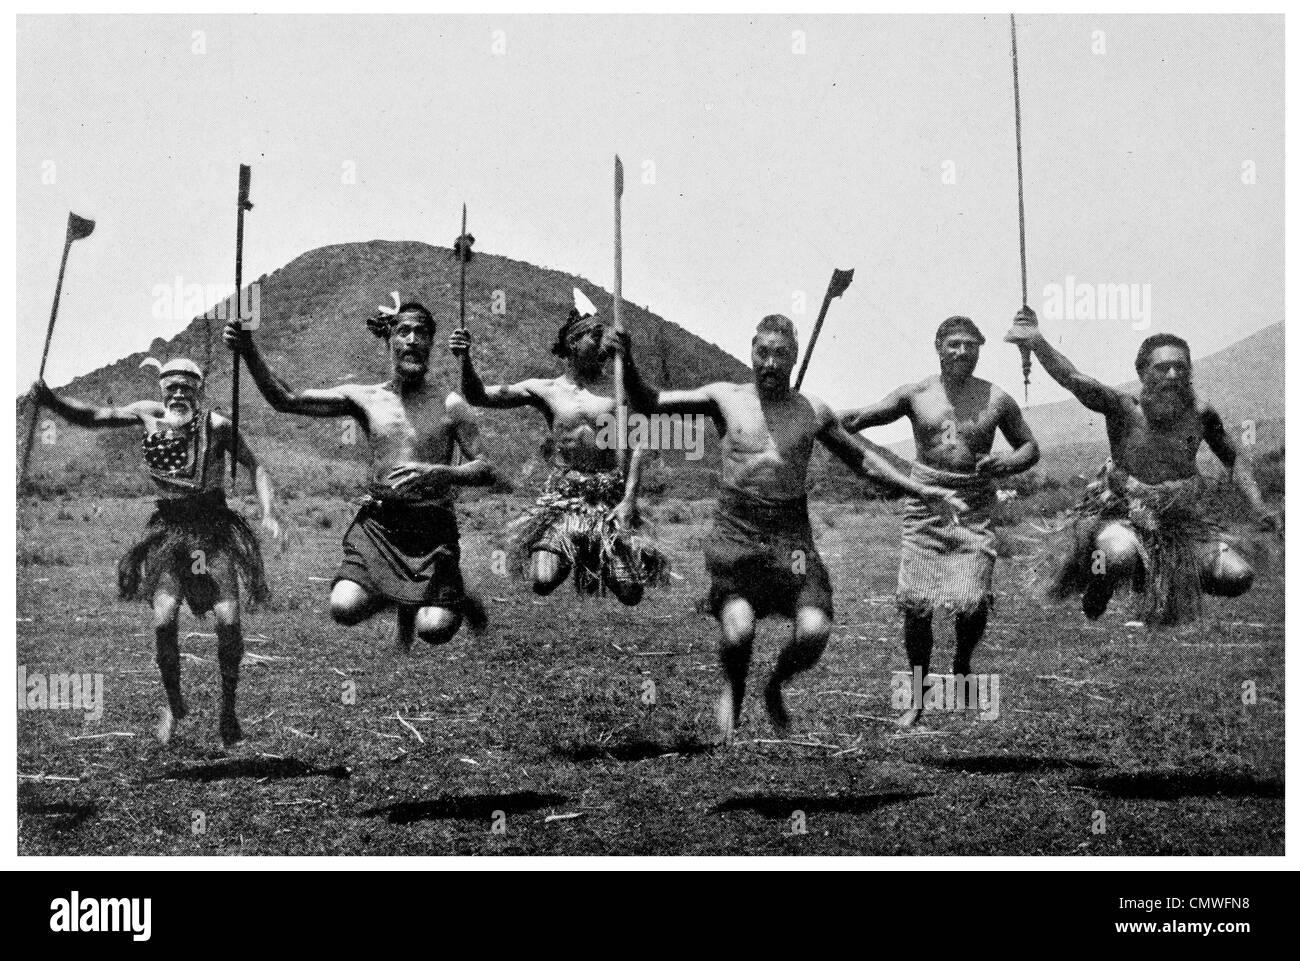 1925 Maori Warriors Rehearsing A Haka Dance New Zealand